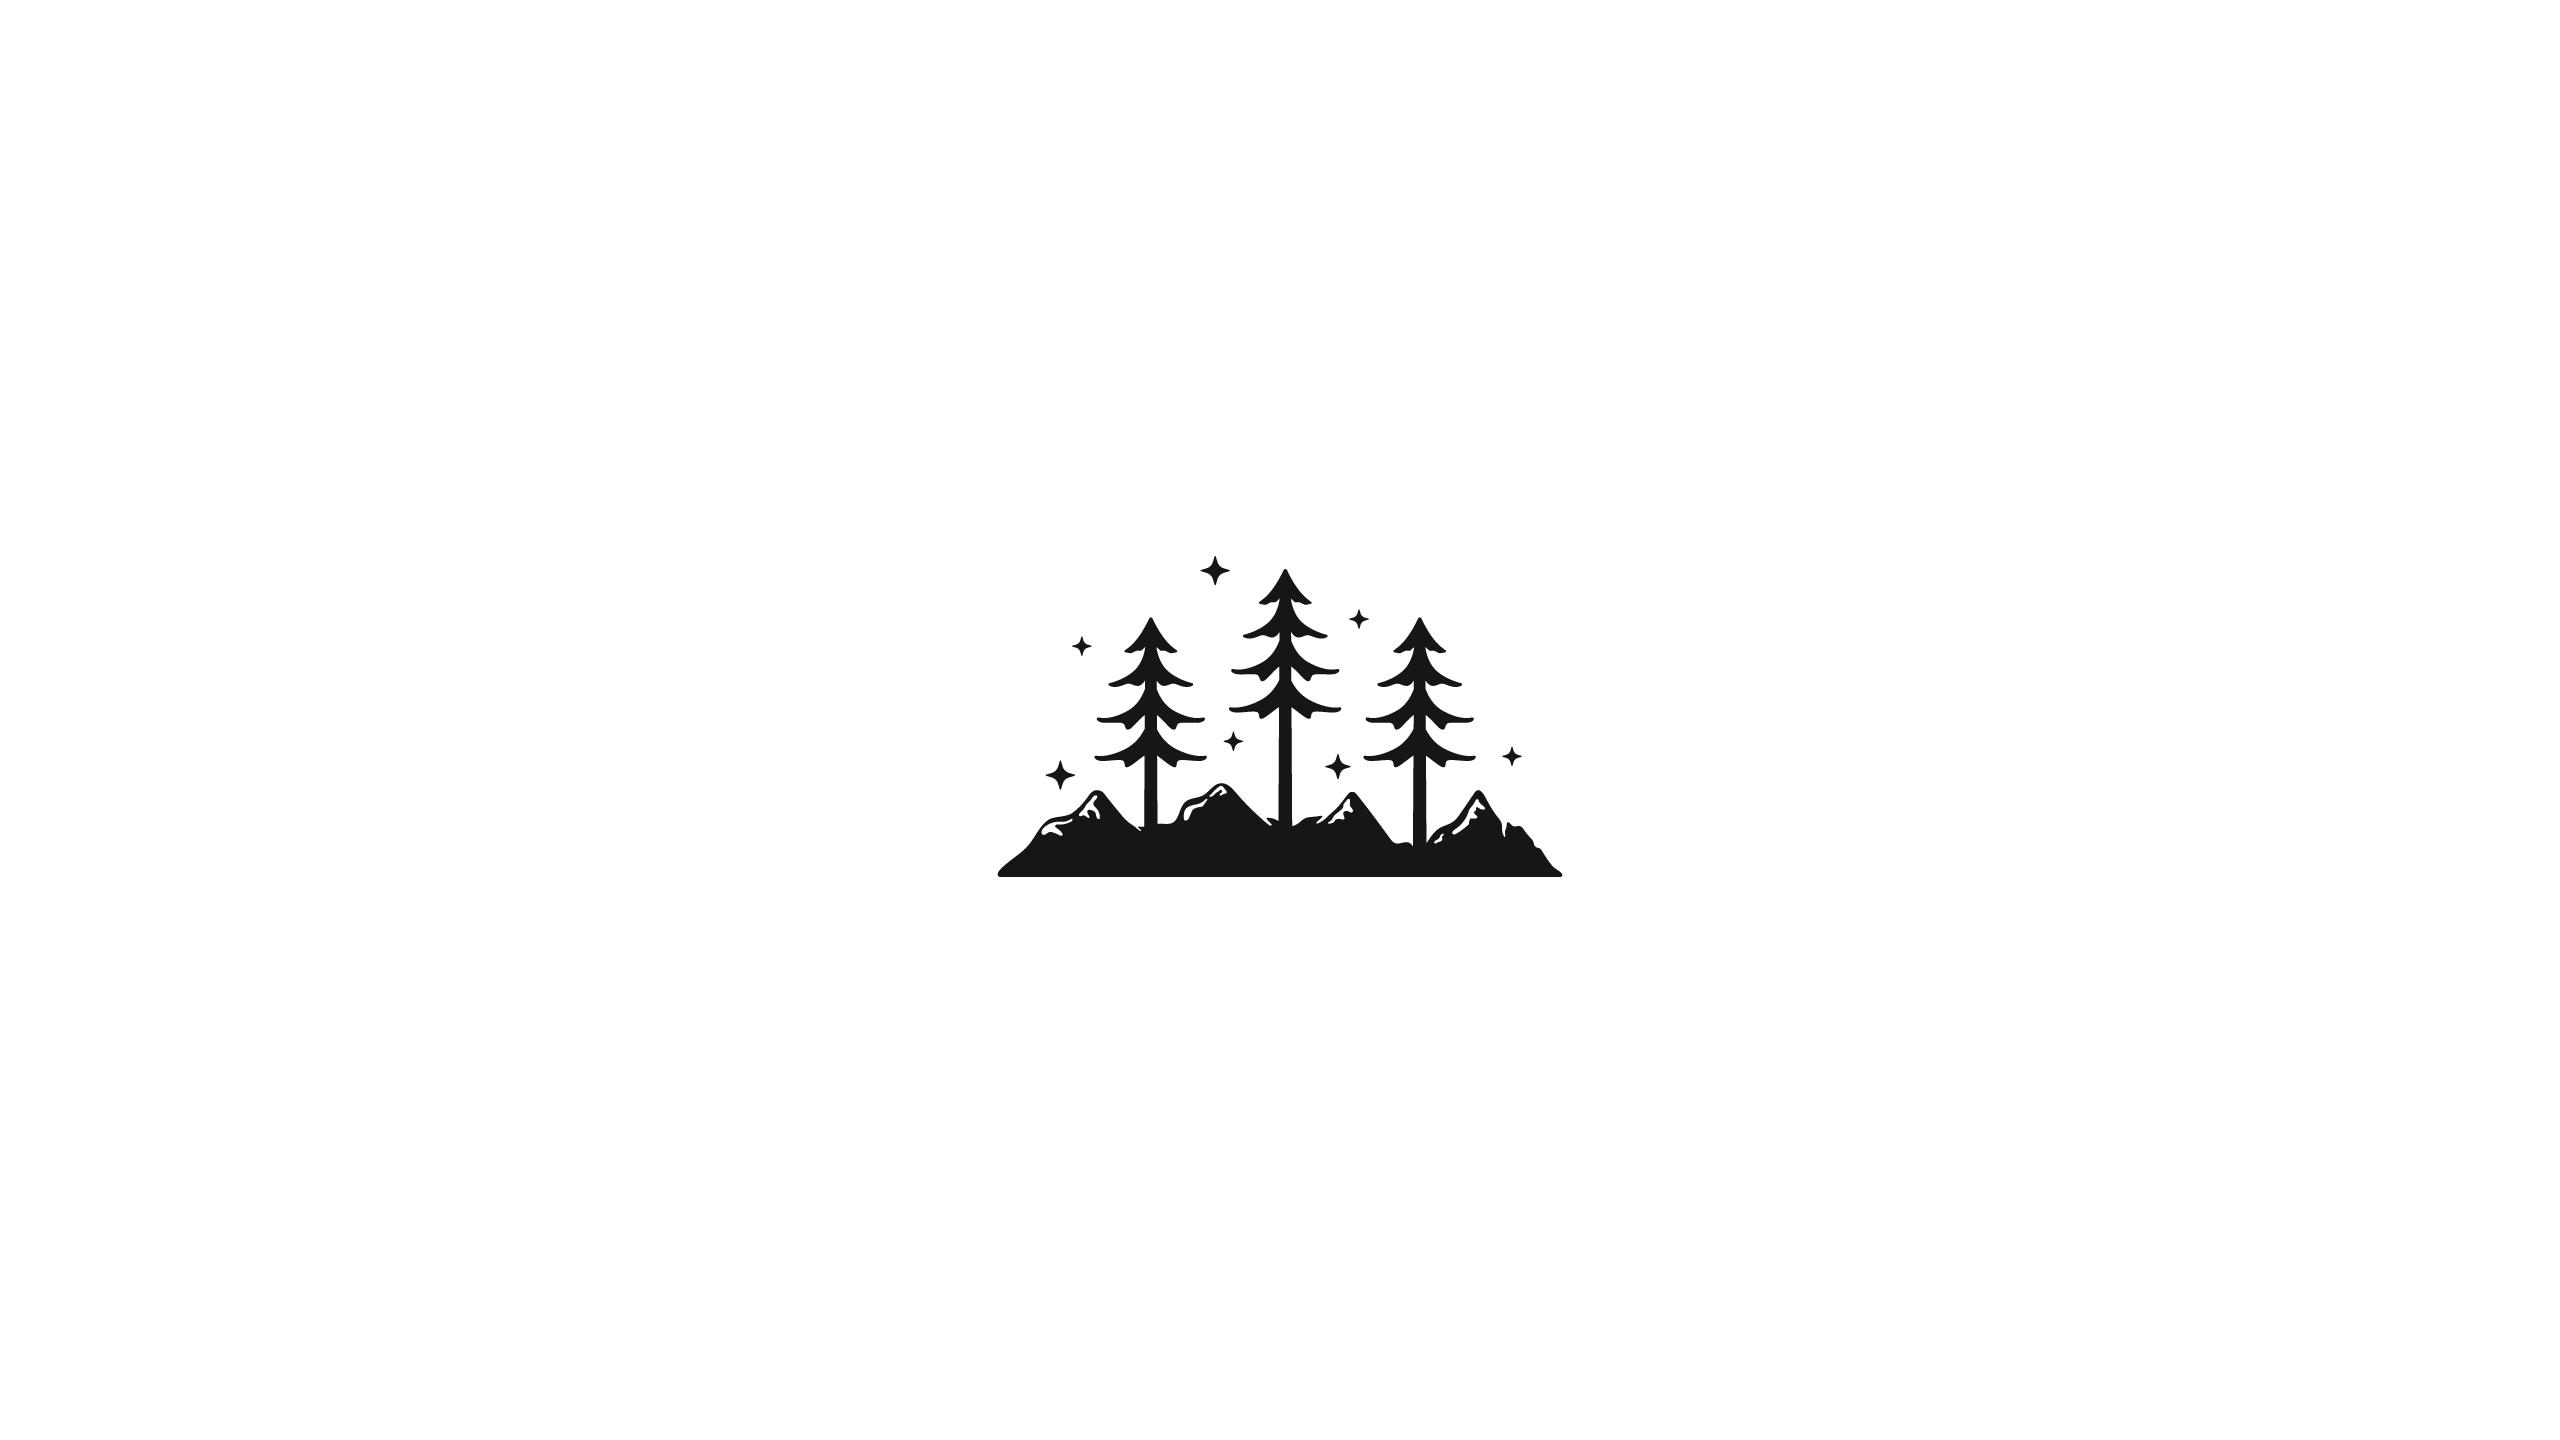 Minimalist Pine Tree: Fondos De Pantalla : Ilustración, Fondo Blanco, Pinos